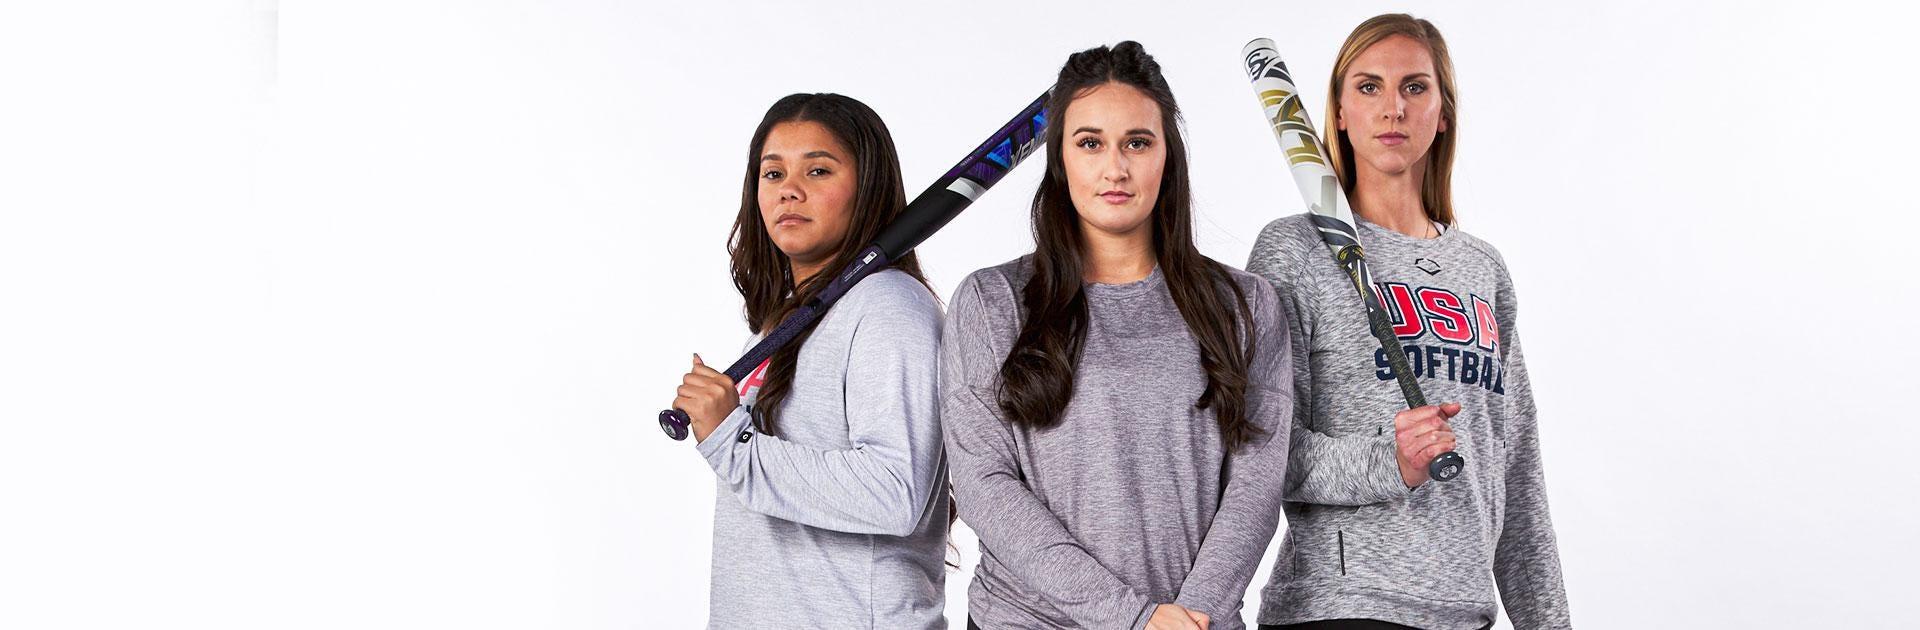 Olympic USA Softball Team Members